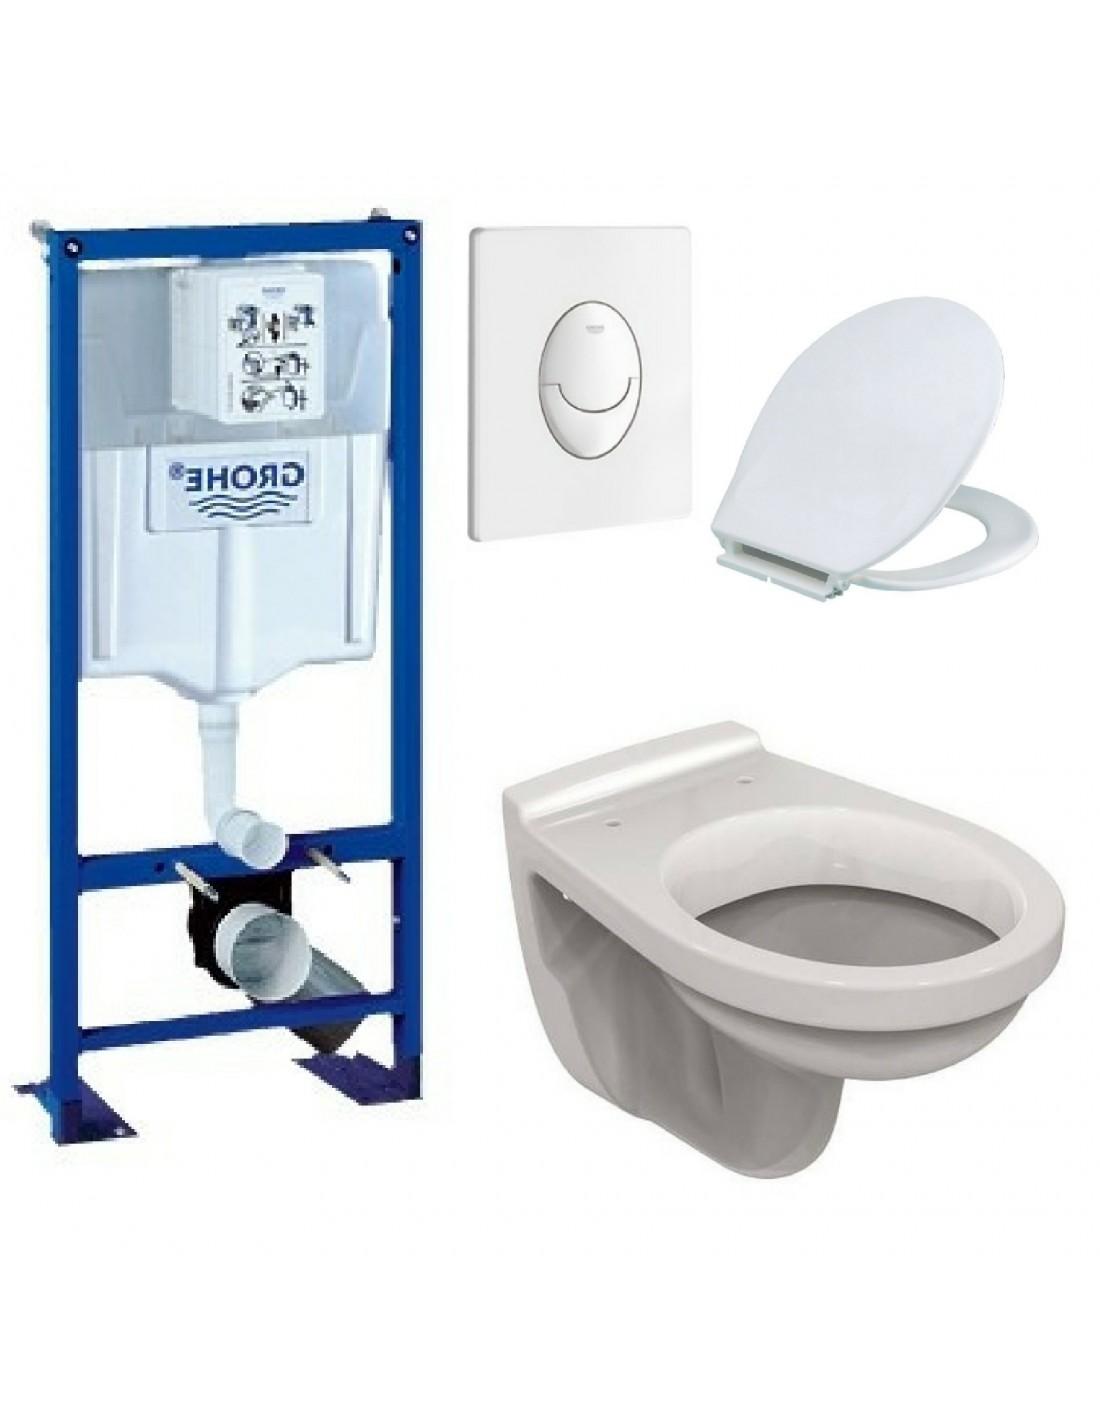 bati support ulysse wc suspendu grohe plaque blanche. Black Bedroom Furniture Sets. Home Design Ideas